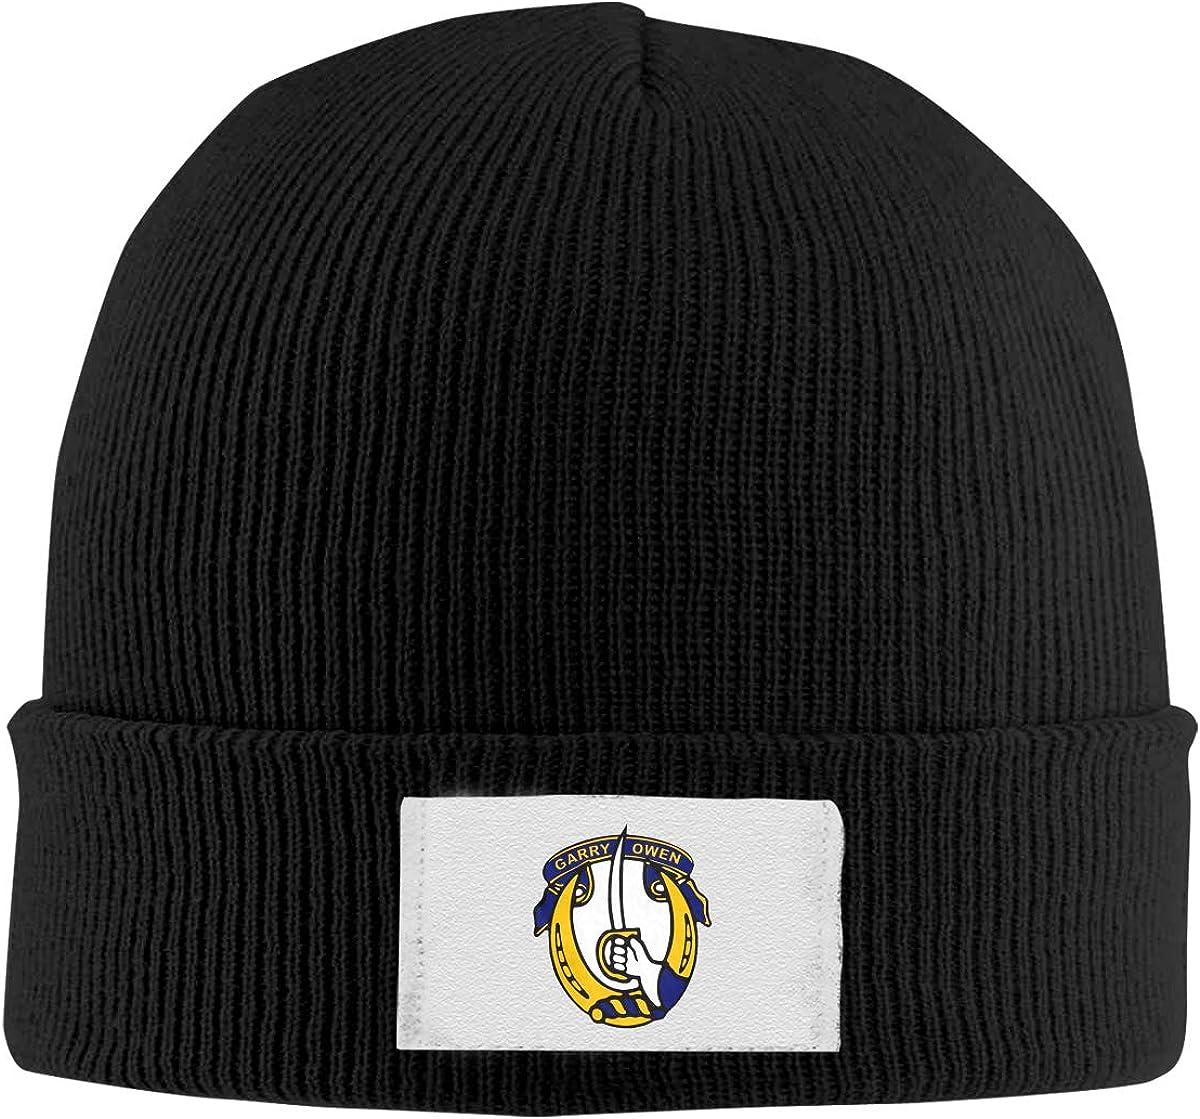 7th Cavalry Top Level Beanie Men Women Unisex Stylish Slouch Beanie Hats Black